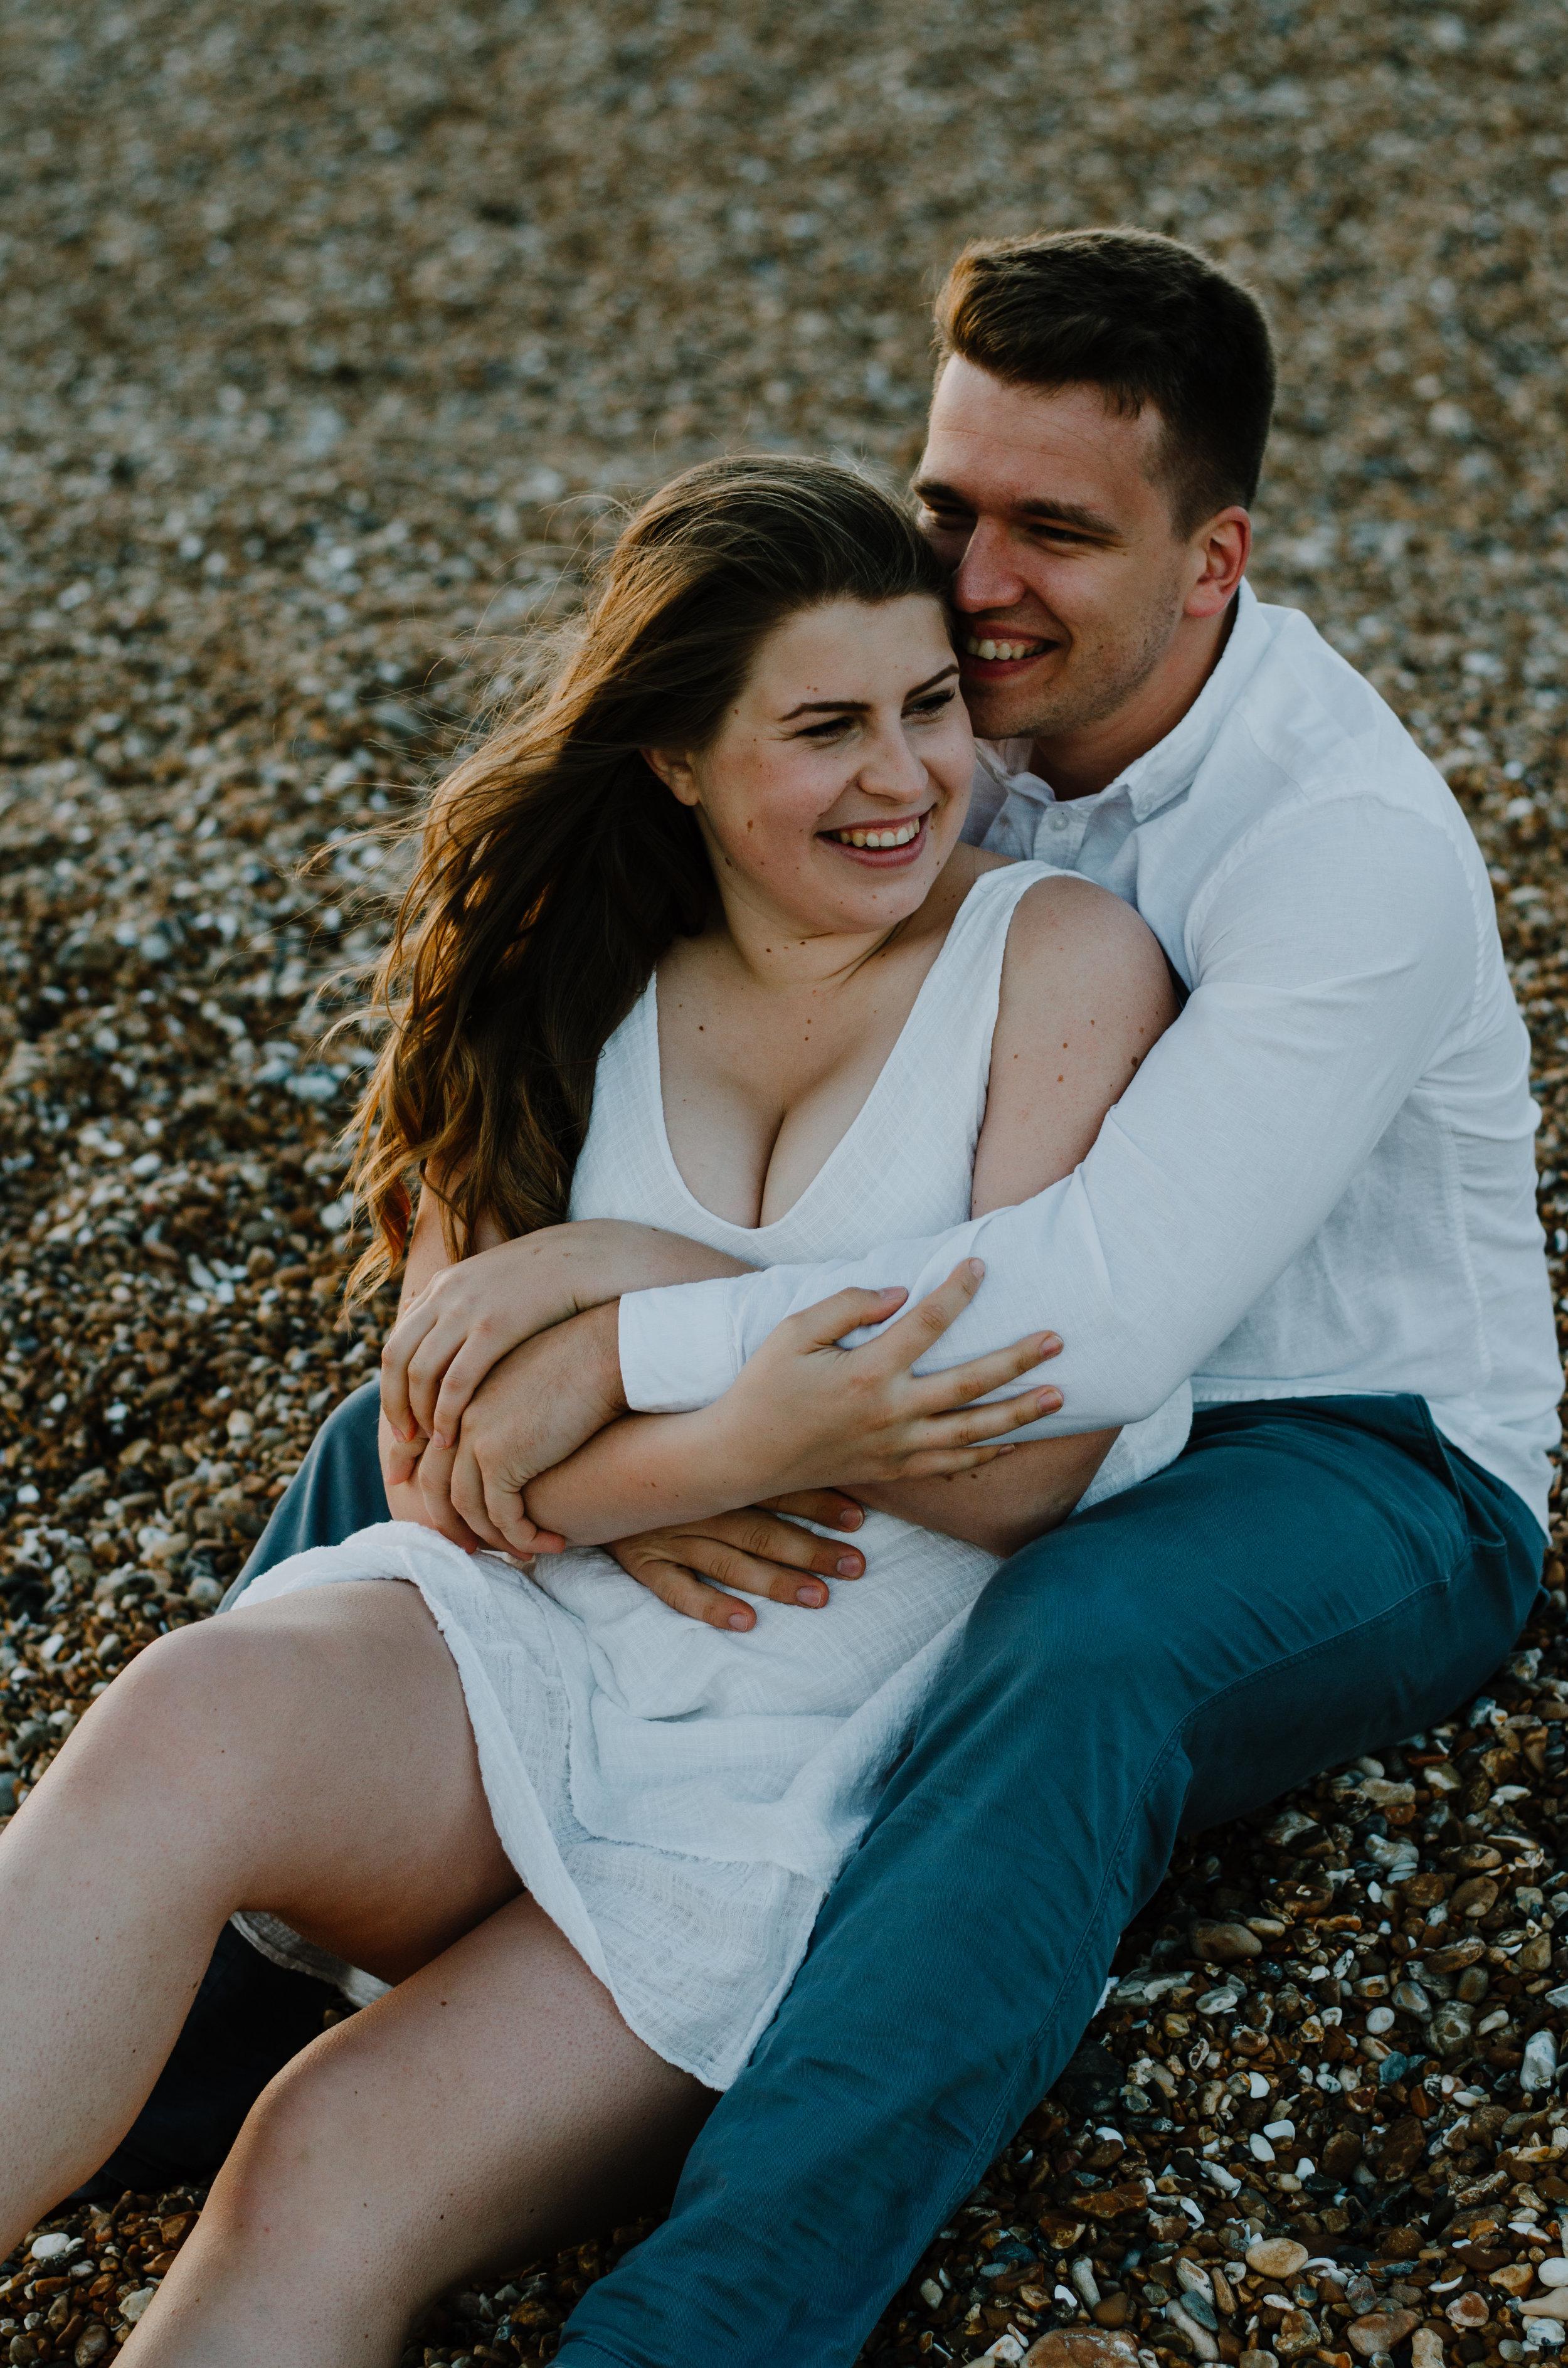 Ieva & Julius - Brighton Beach - Couple Session - Aiste Saulyte Photography-48.jpg